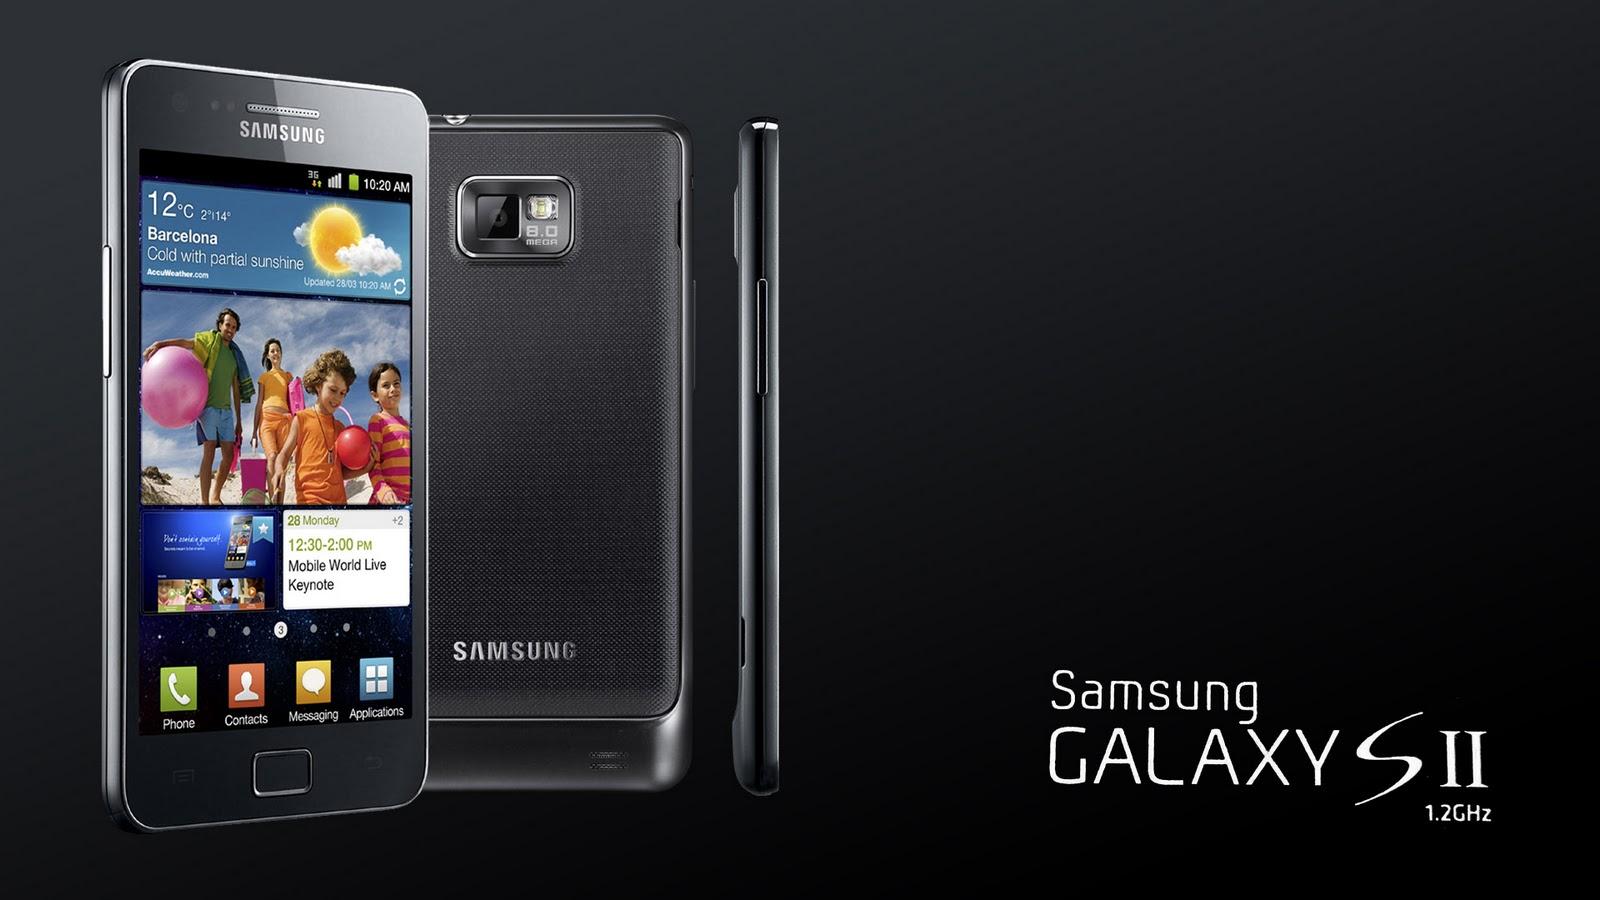 Samsung S2 Multiple Wallpaper Images: Wallpaper: Galaxy S3 Screen Wallpaper Resolution